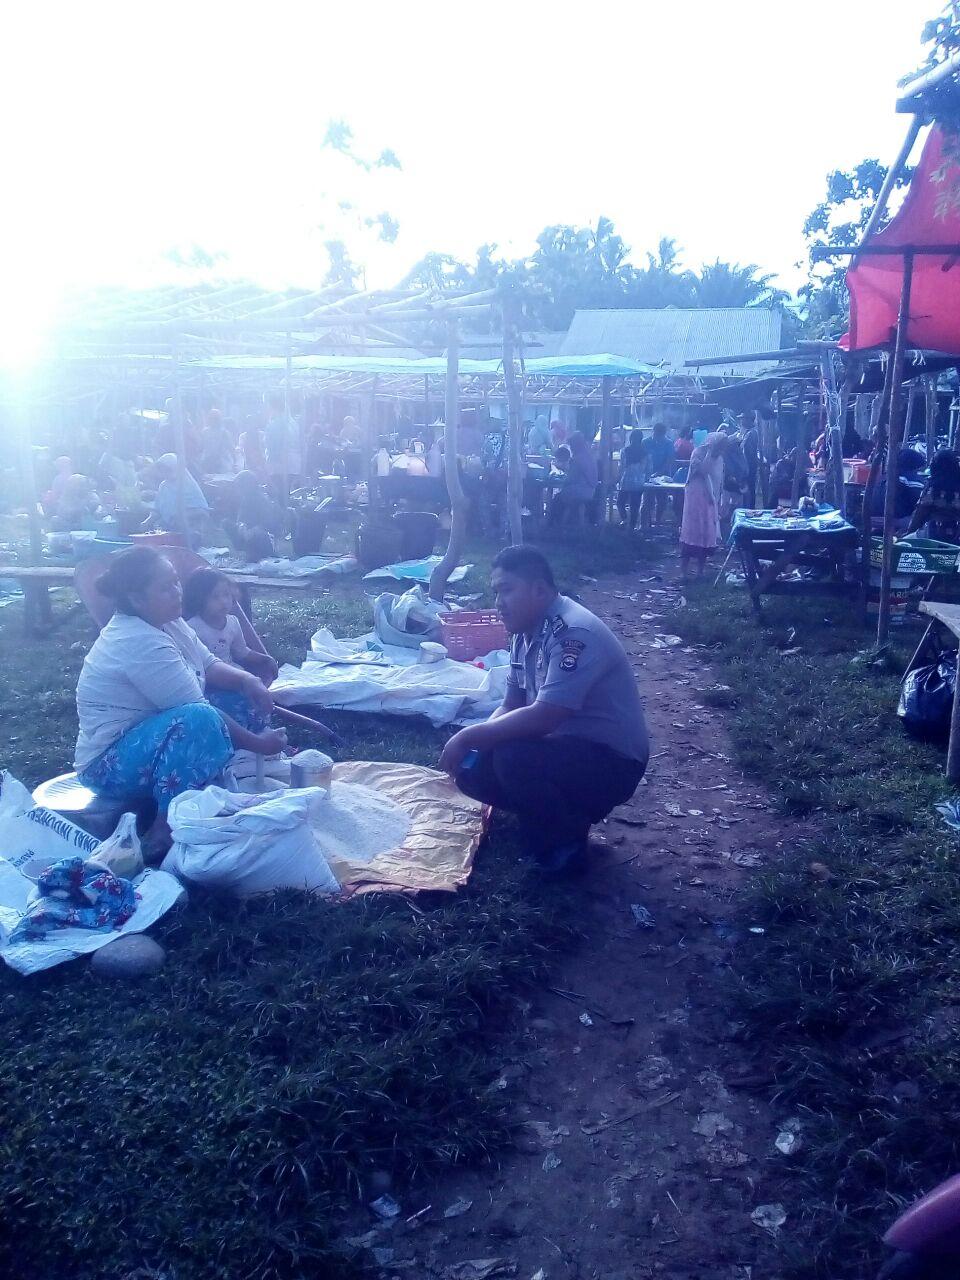 Masuk Pasar, Polisi Interaksi Bersama Pedagang dan Pembeli